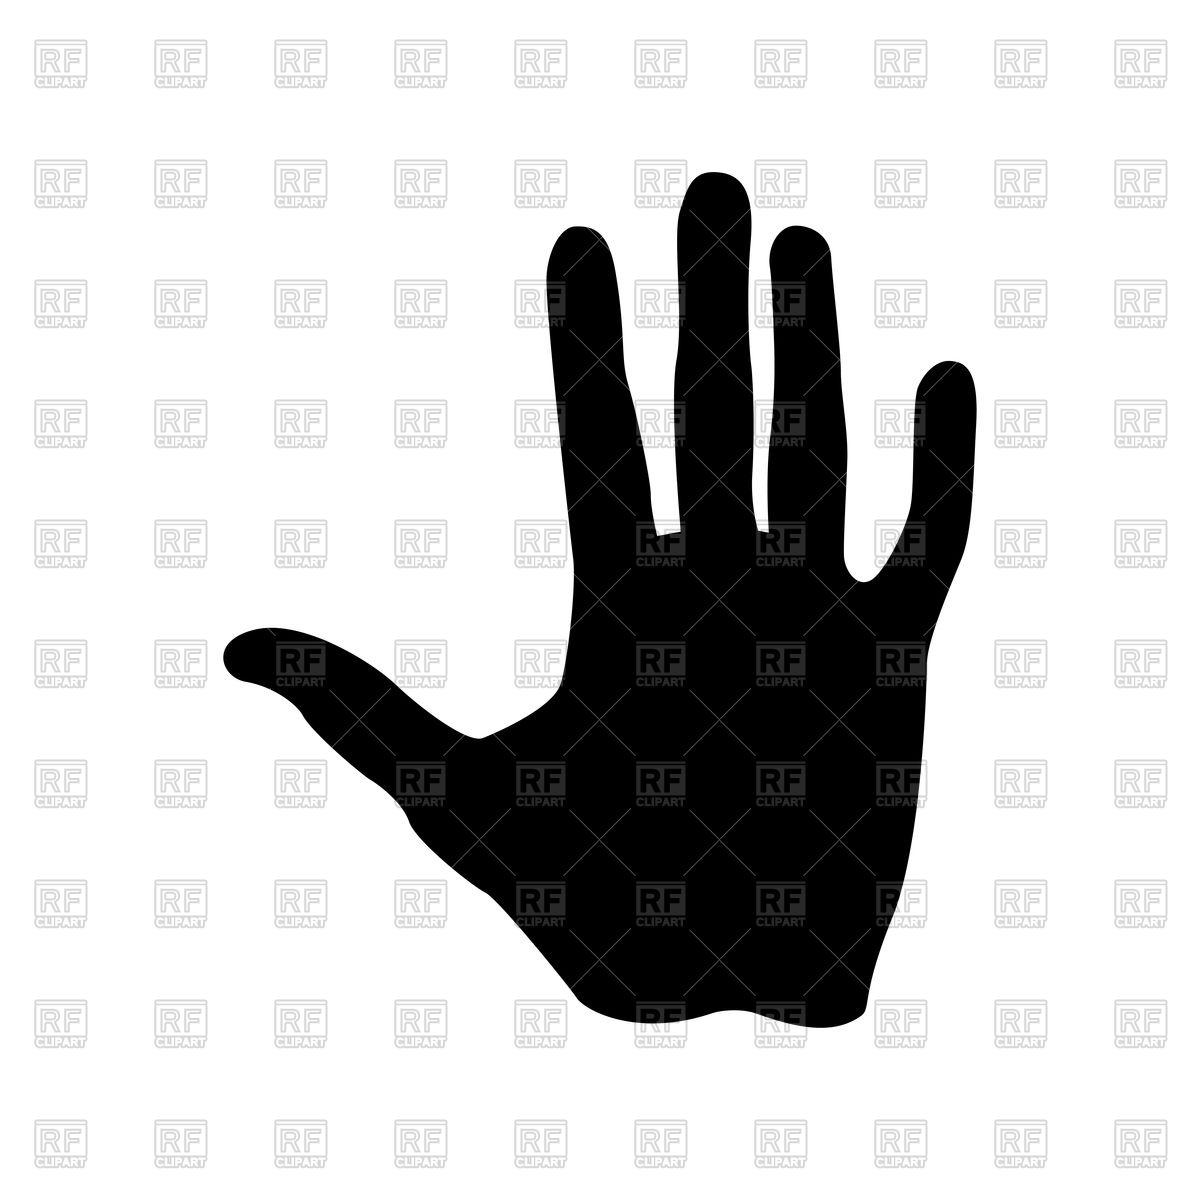 1200x1200 Human Hand Silhouette